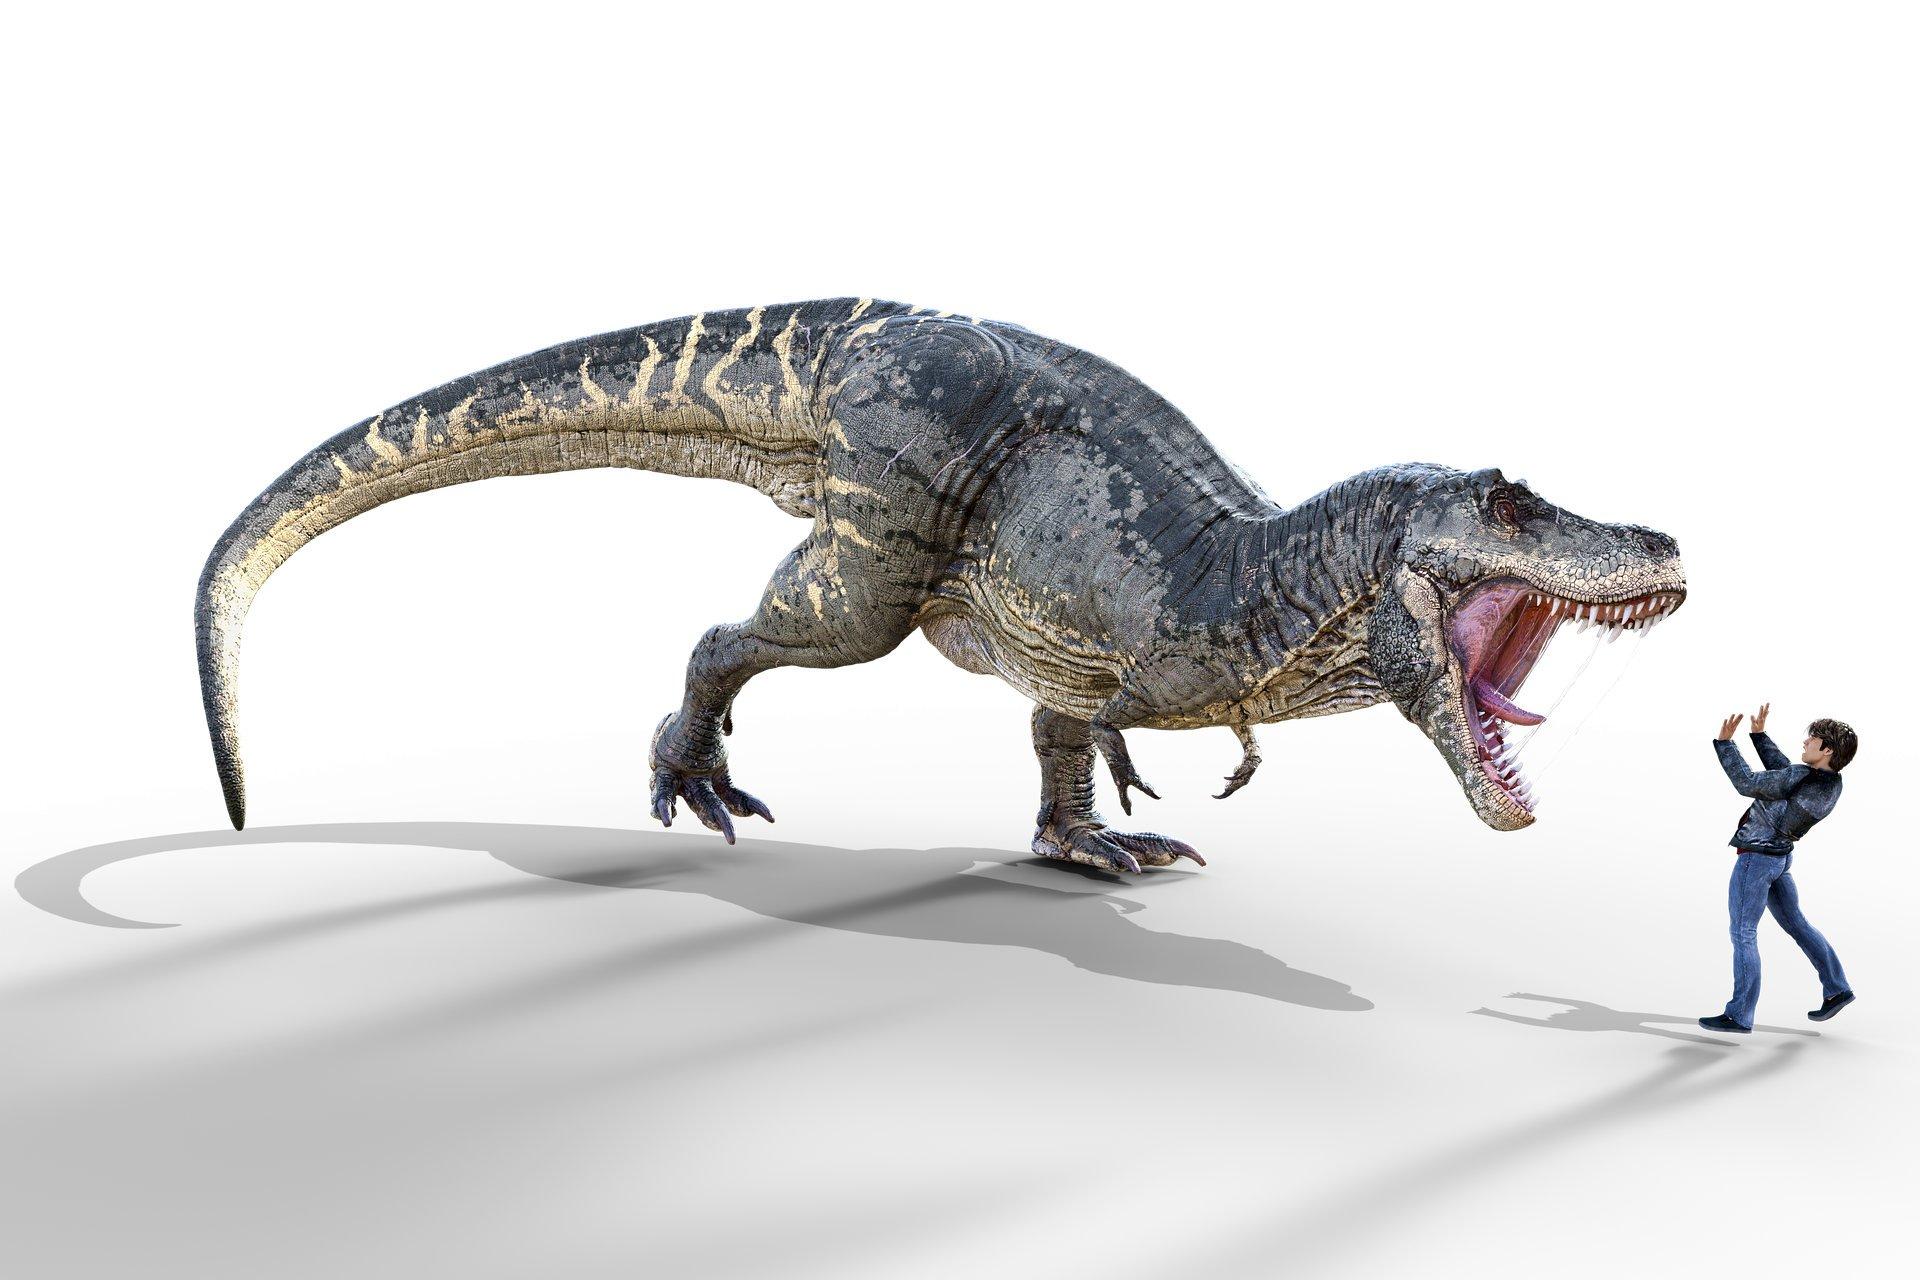 Tiranosaurio contra humano. Ilustración artística  https://www.maxpixel.net/T-Rex-Dino-Dinosaur-Extinct-Tyrannosaurus-Rex-4708418